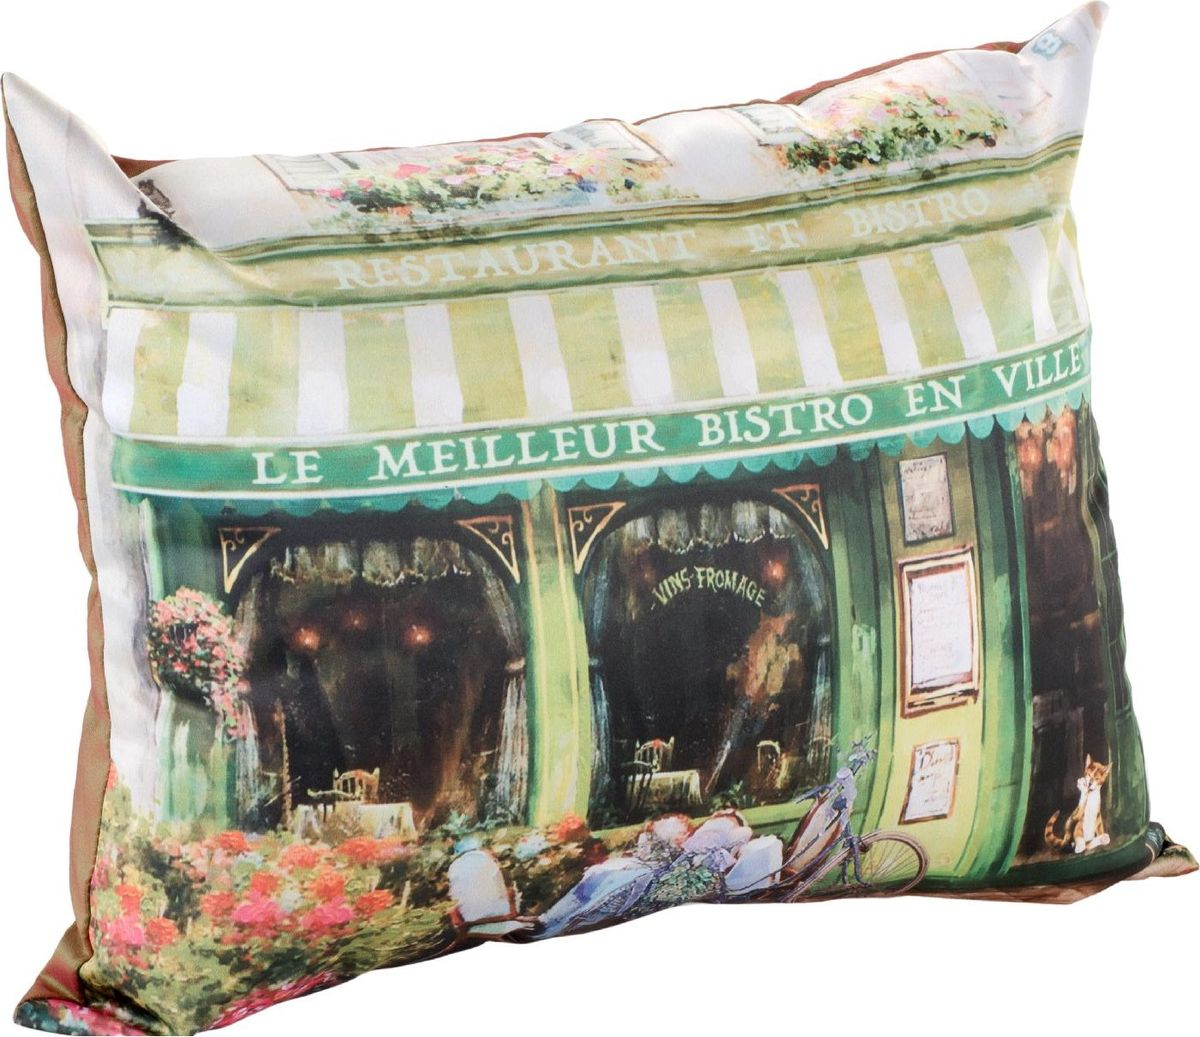 Подушка декоративная GiftnHome Парижское бистро, 30 х 40 см02-V231/1Подушка декоративная Парижское бистро, материал: Атлас, (искусственный шелк). Наволочка на молнии + подушка с синтетическим наполнителем.